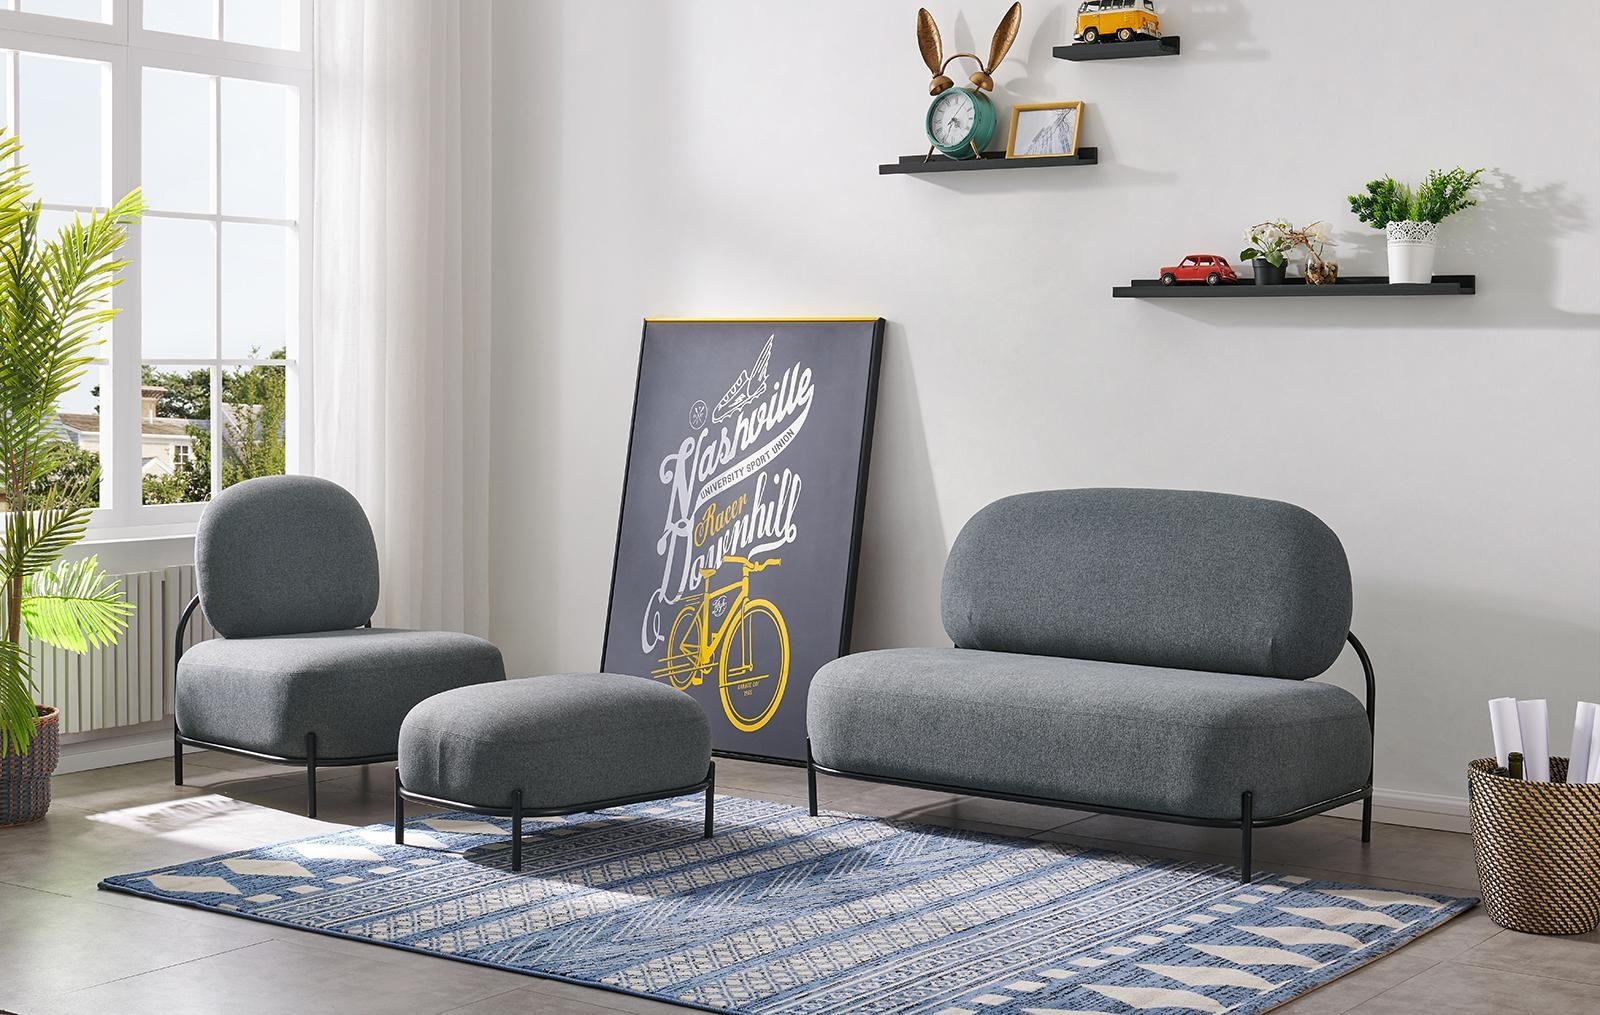 Кресло ESF SOFA 06-01 серый, диван ESF SOFA 06-02 (2-х местный) серый и пуф SOFA-06-0T серый